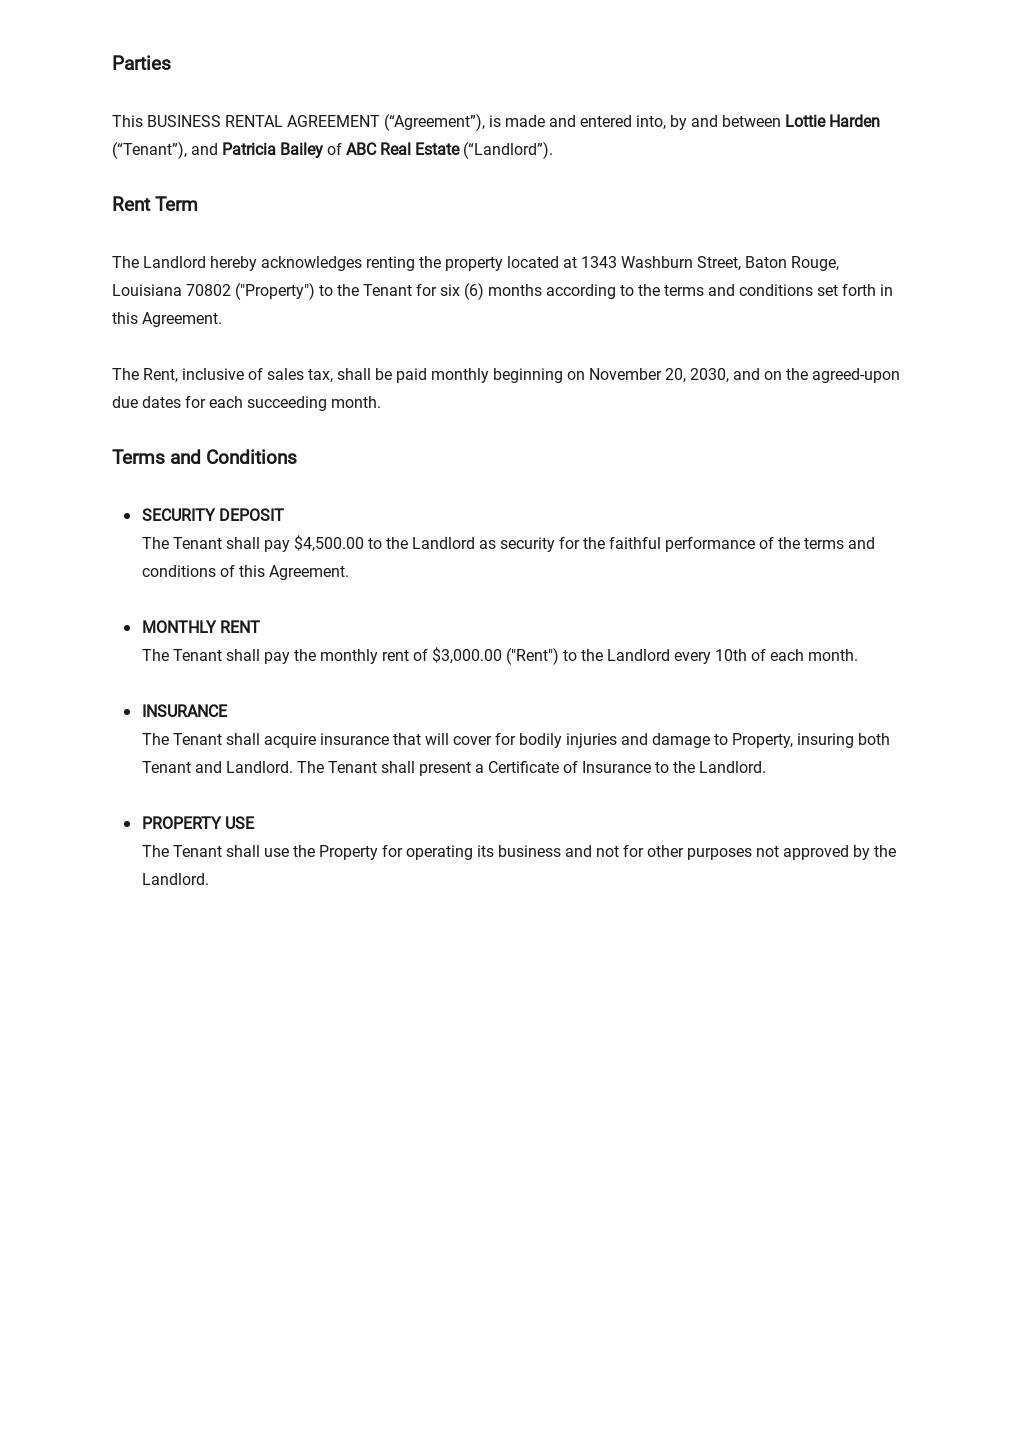 Business Rental Agreement Template 1.jpe